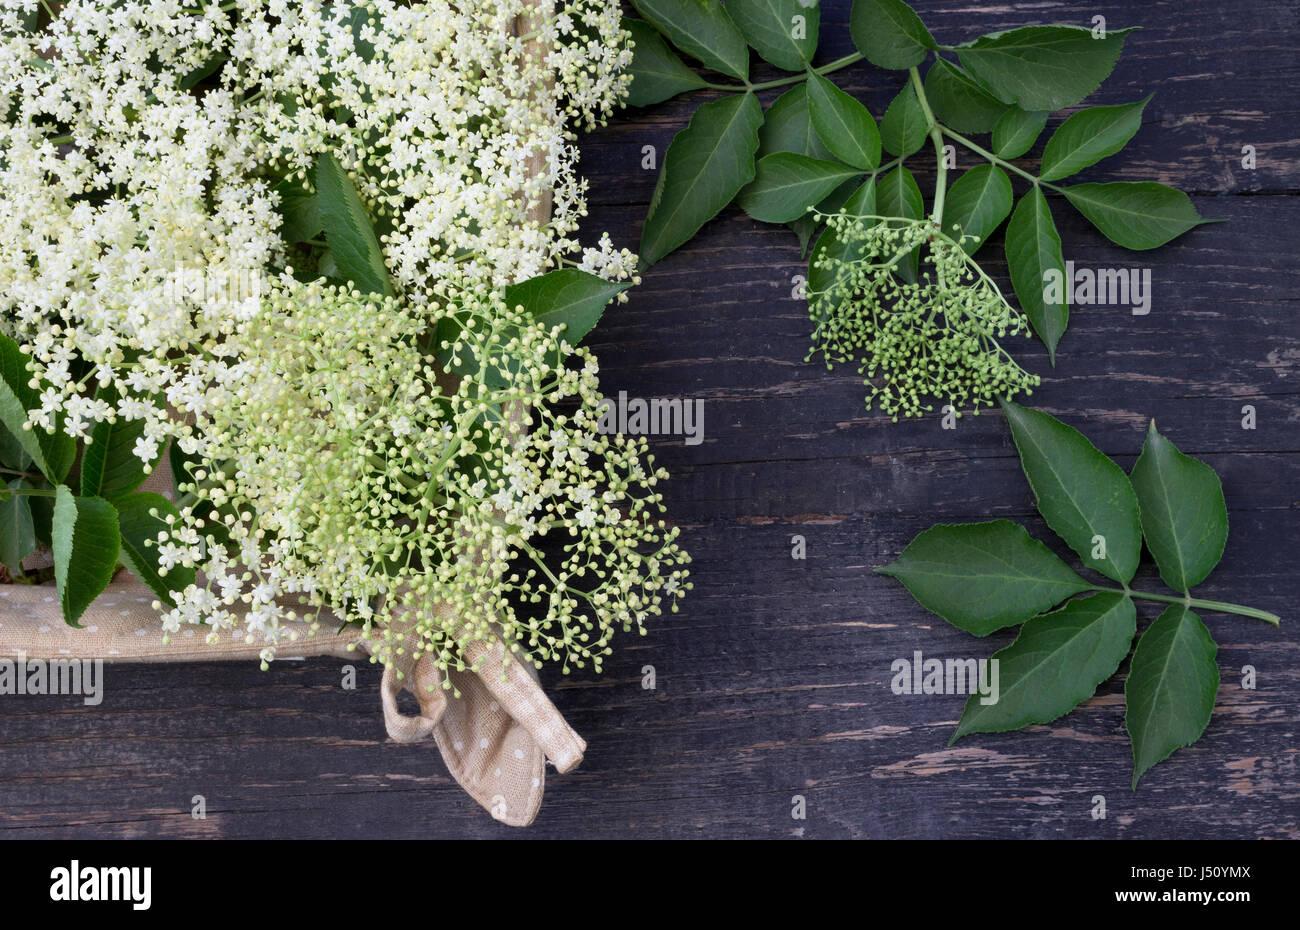 Elderflowers dans panier sur tableau noir Photo Stock